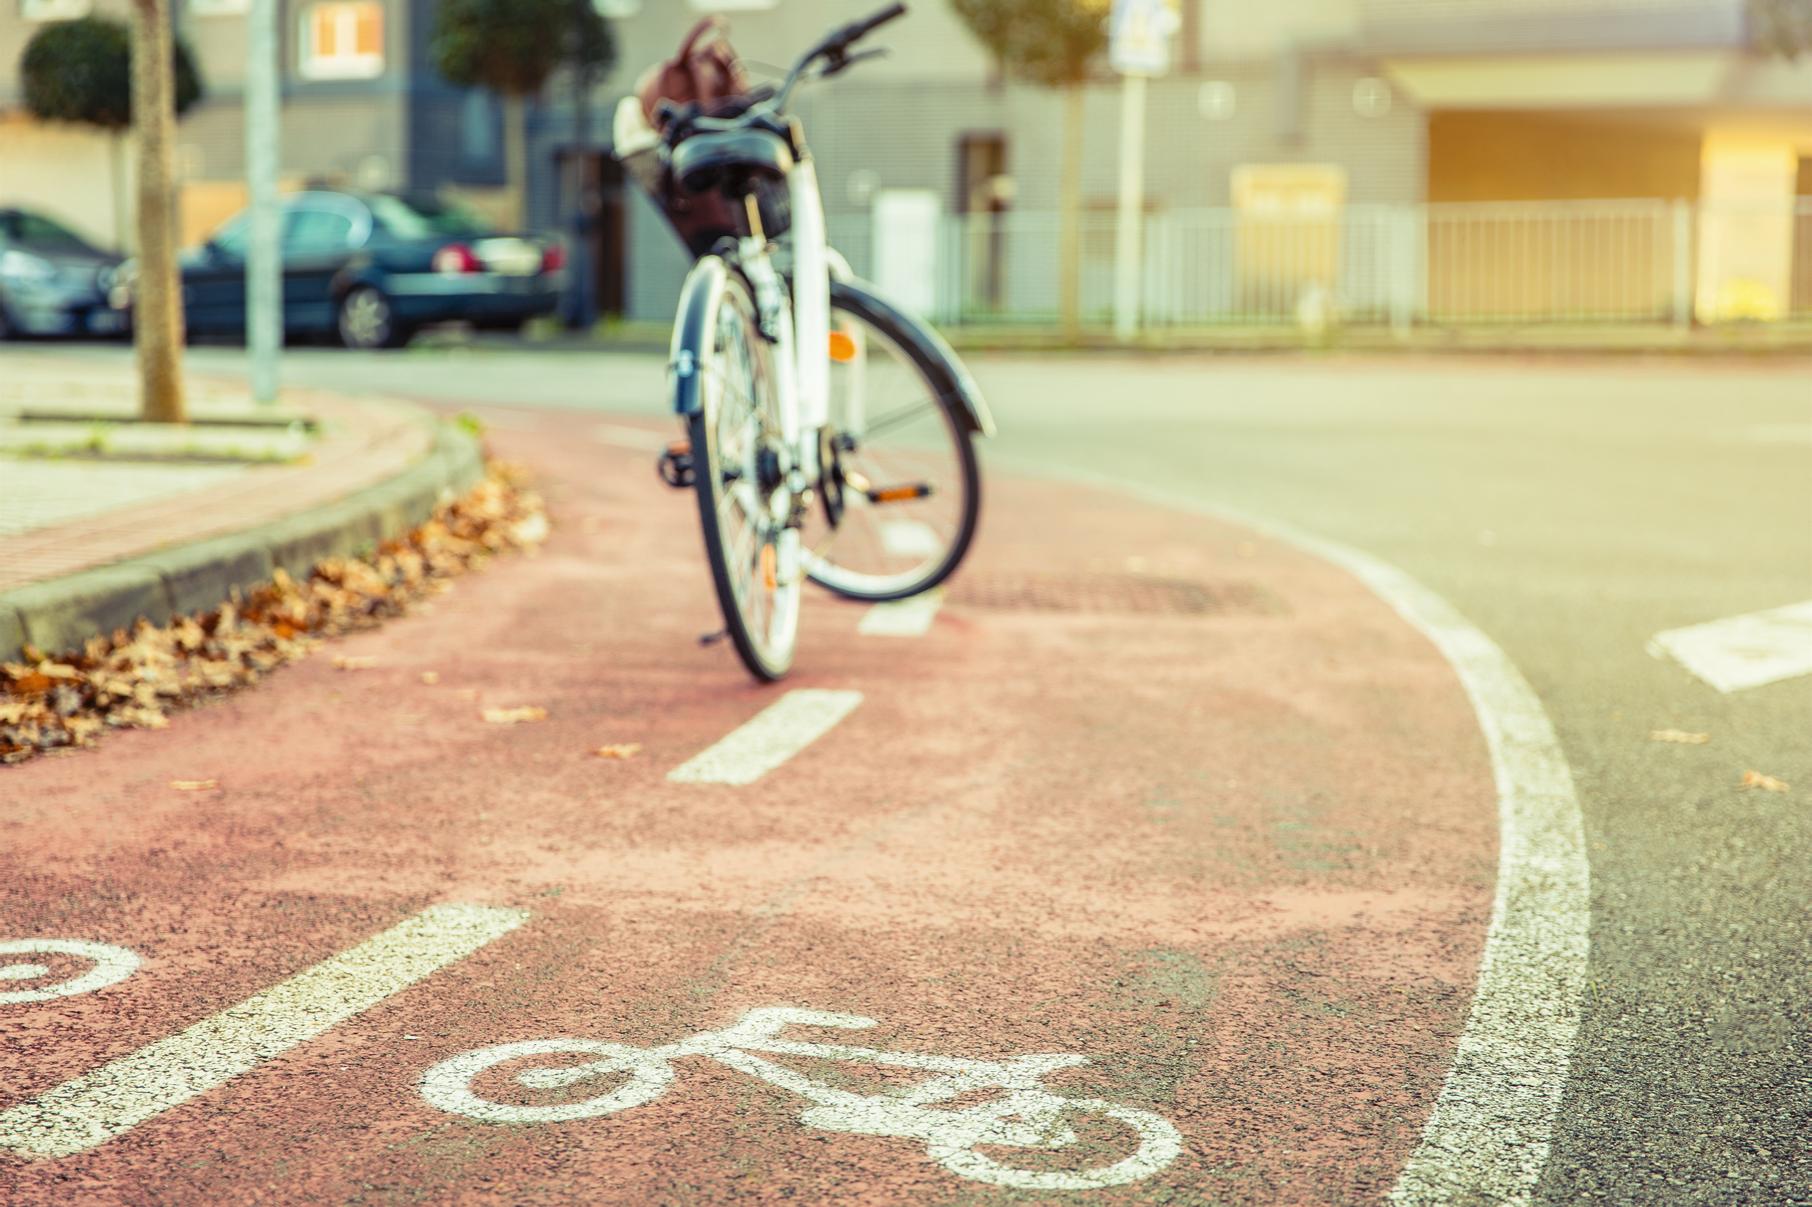 bicycle-road-symbol-over-street-bike-lane-with-bic-97D3YWS